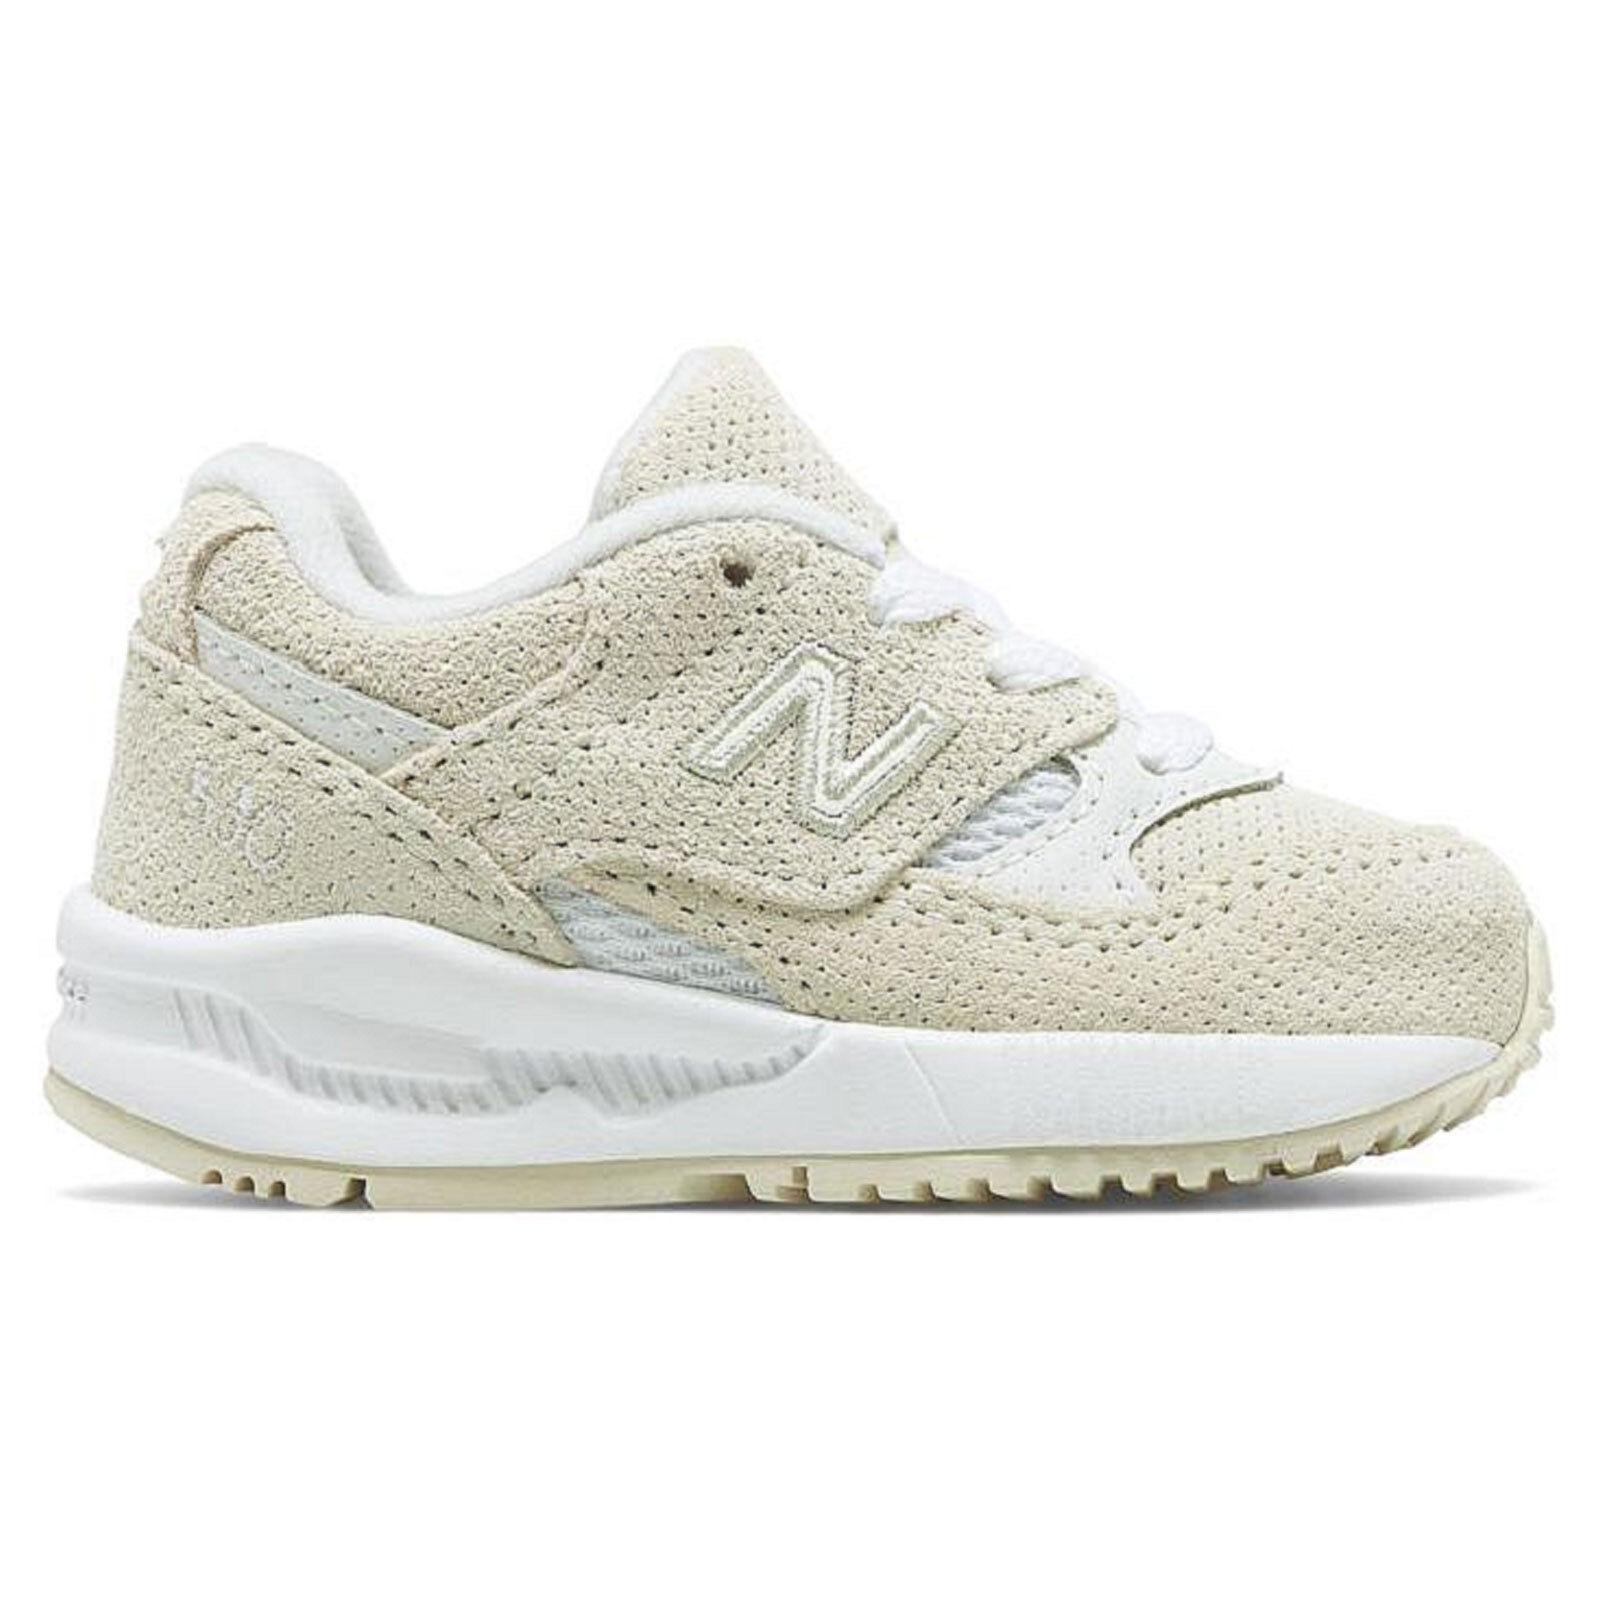 1bac5f5028 New Balance 530 Sneaker Babyschuhe Kinderschuhe Turnschuhe Sportschuhe  KL530TWI *